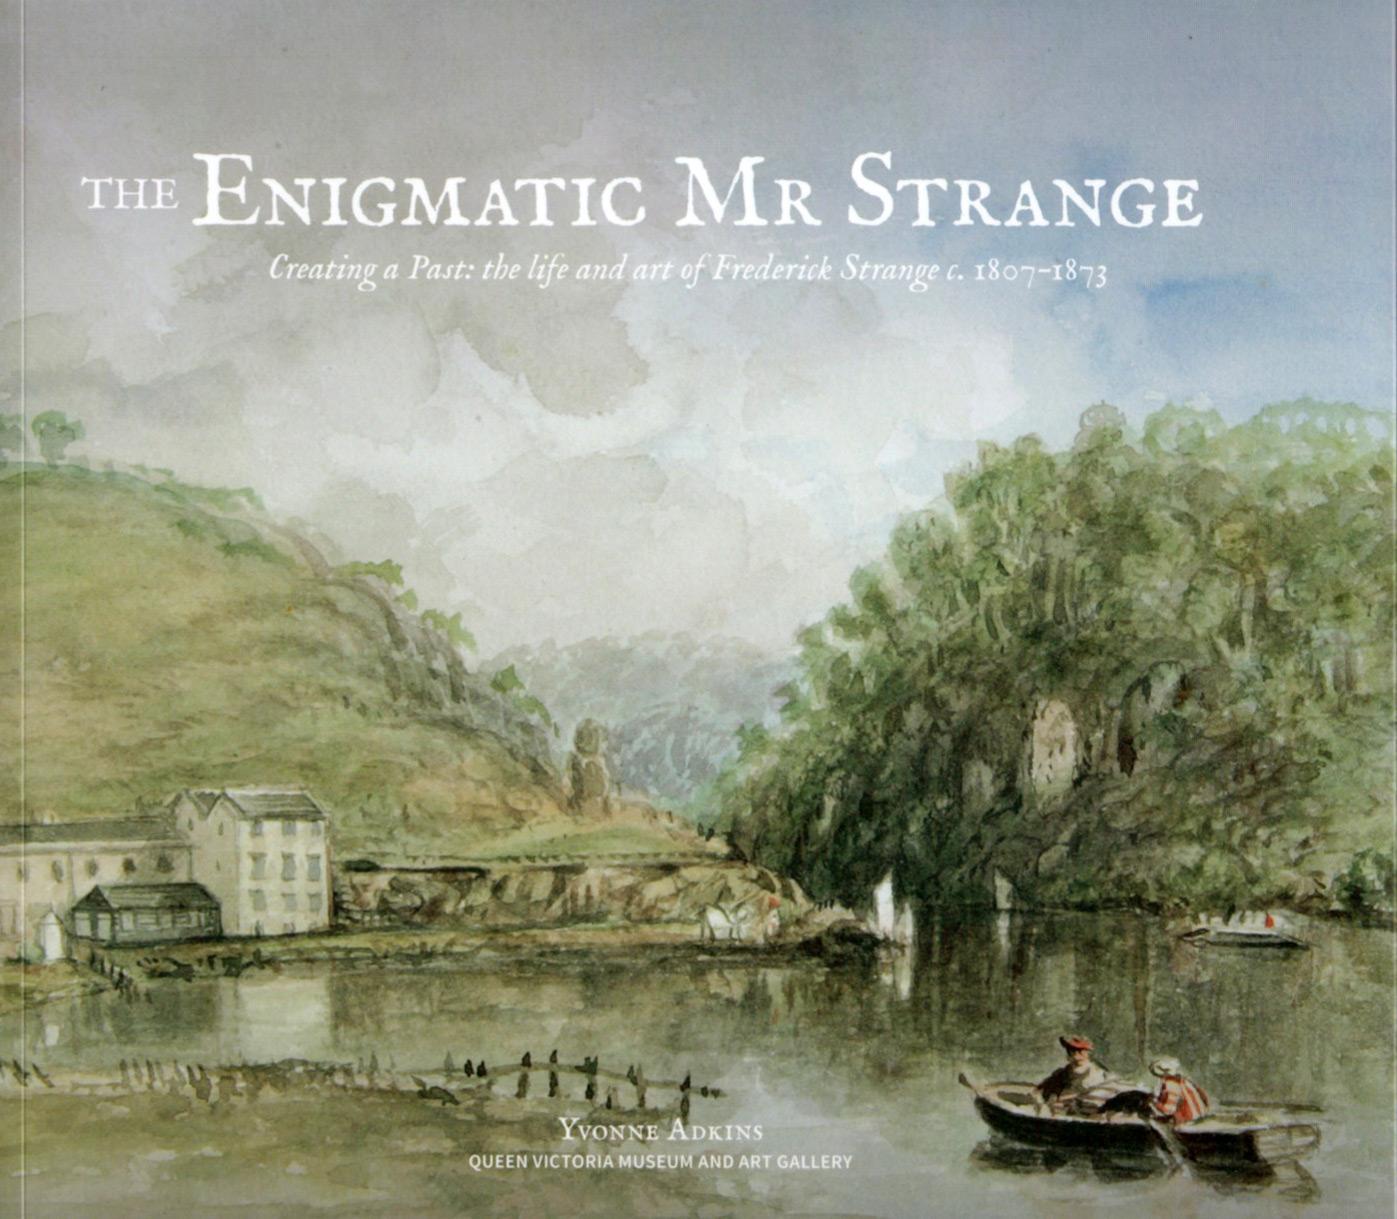 Enigmatic Mr Strange (The)